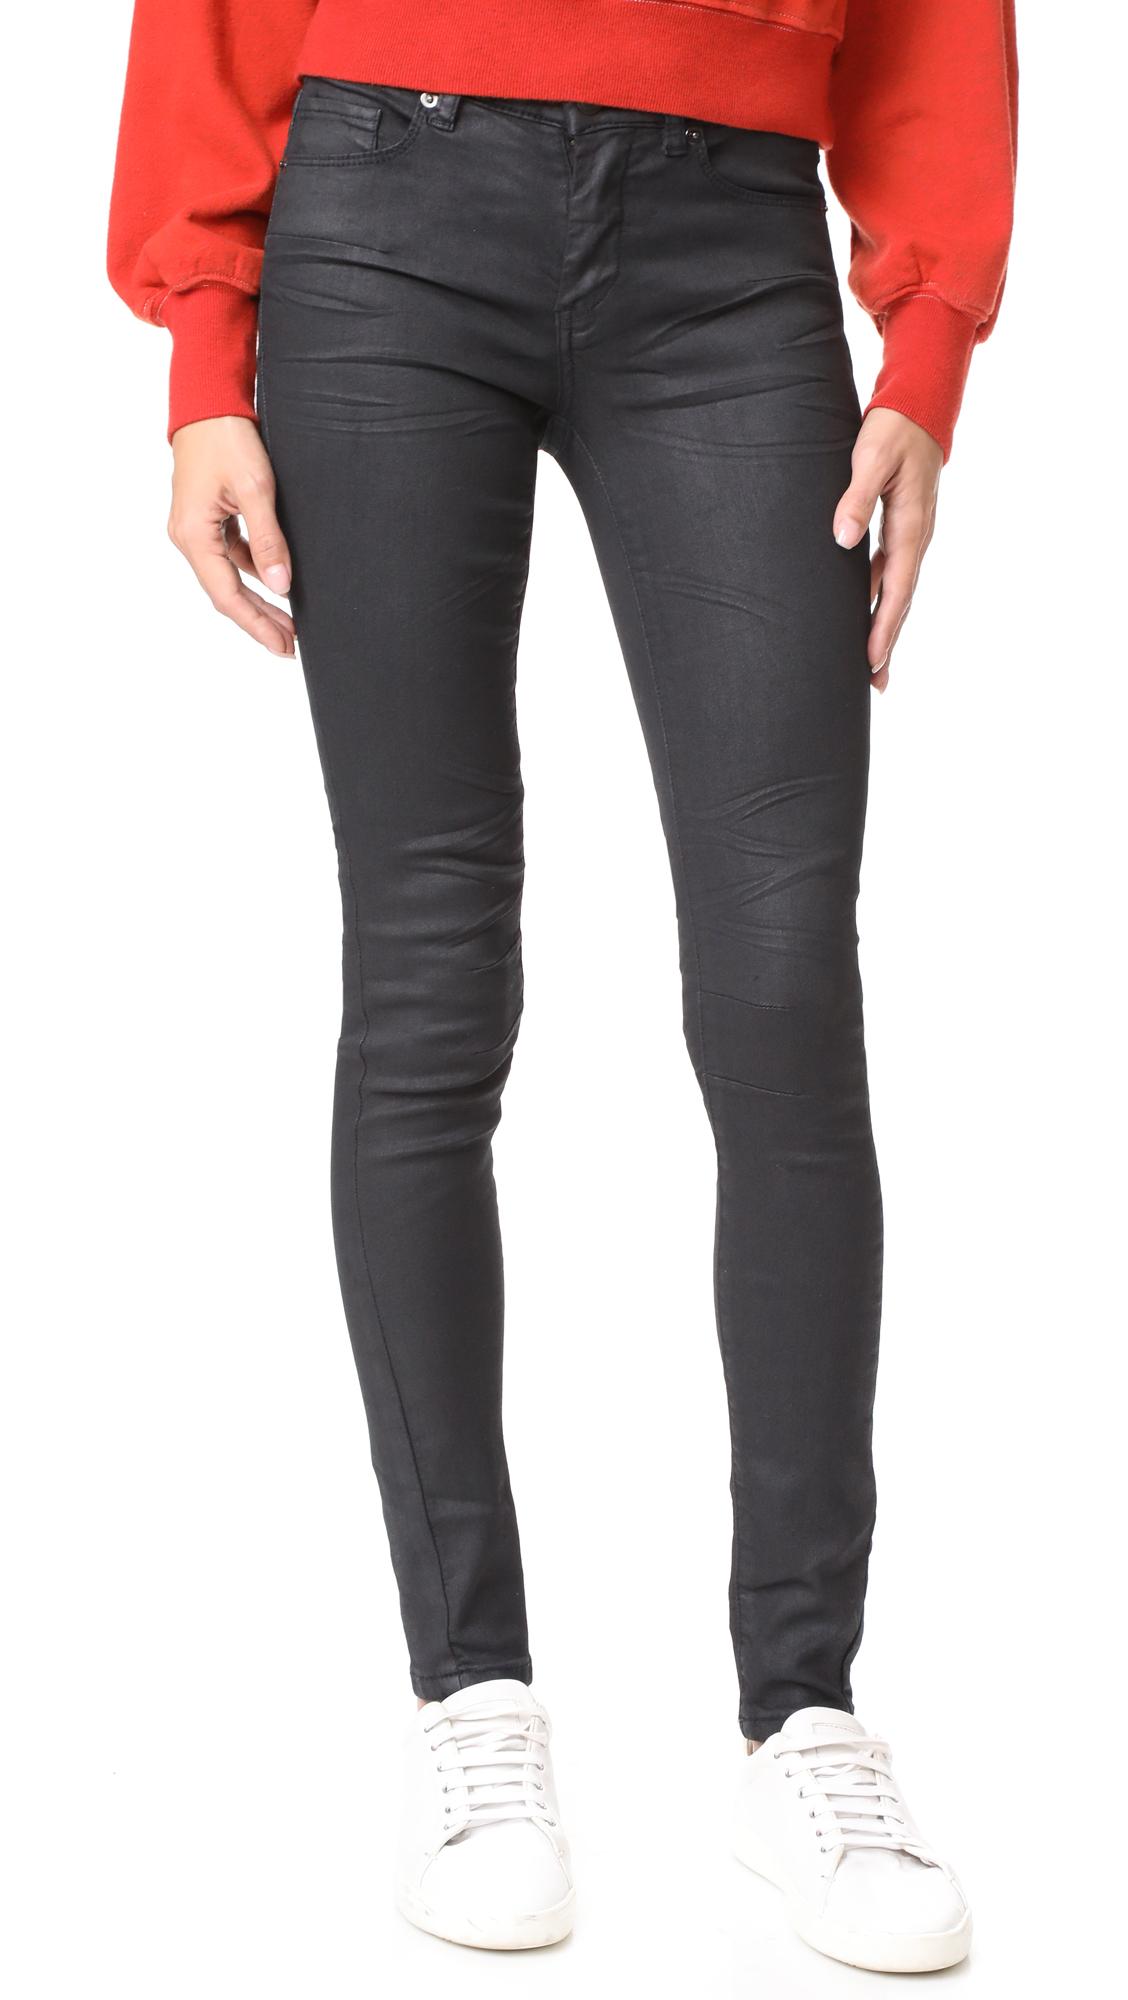 Blank Denim Coated Skinny Jeans - Follow Me